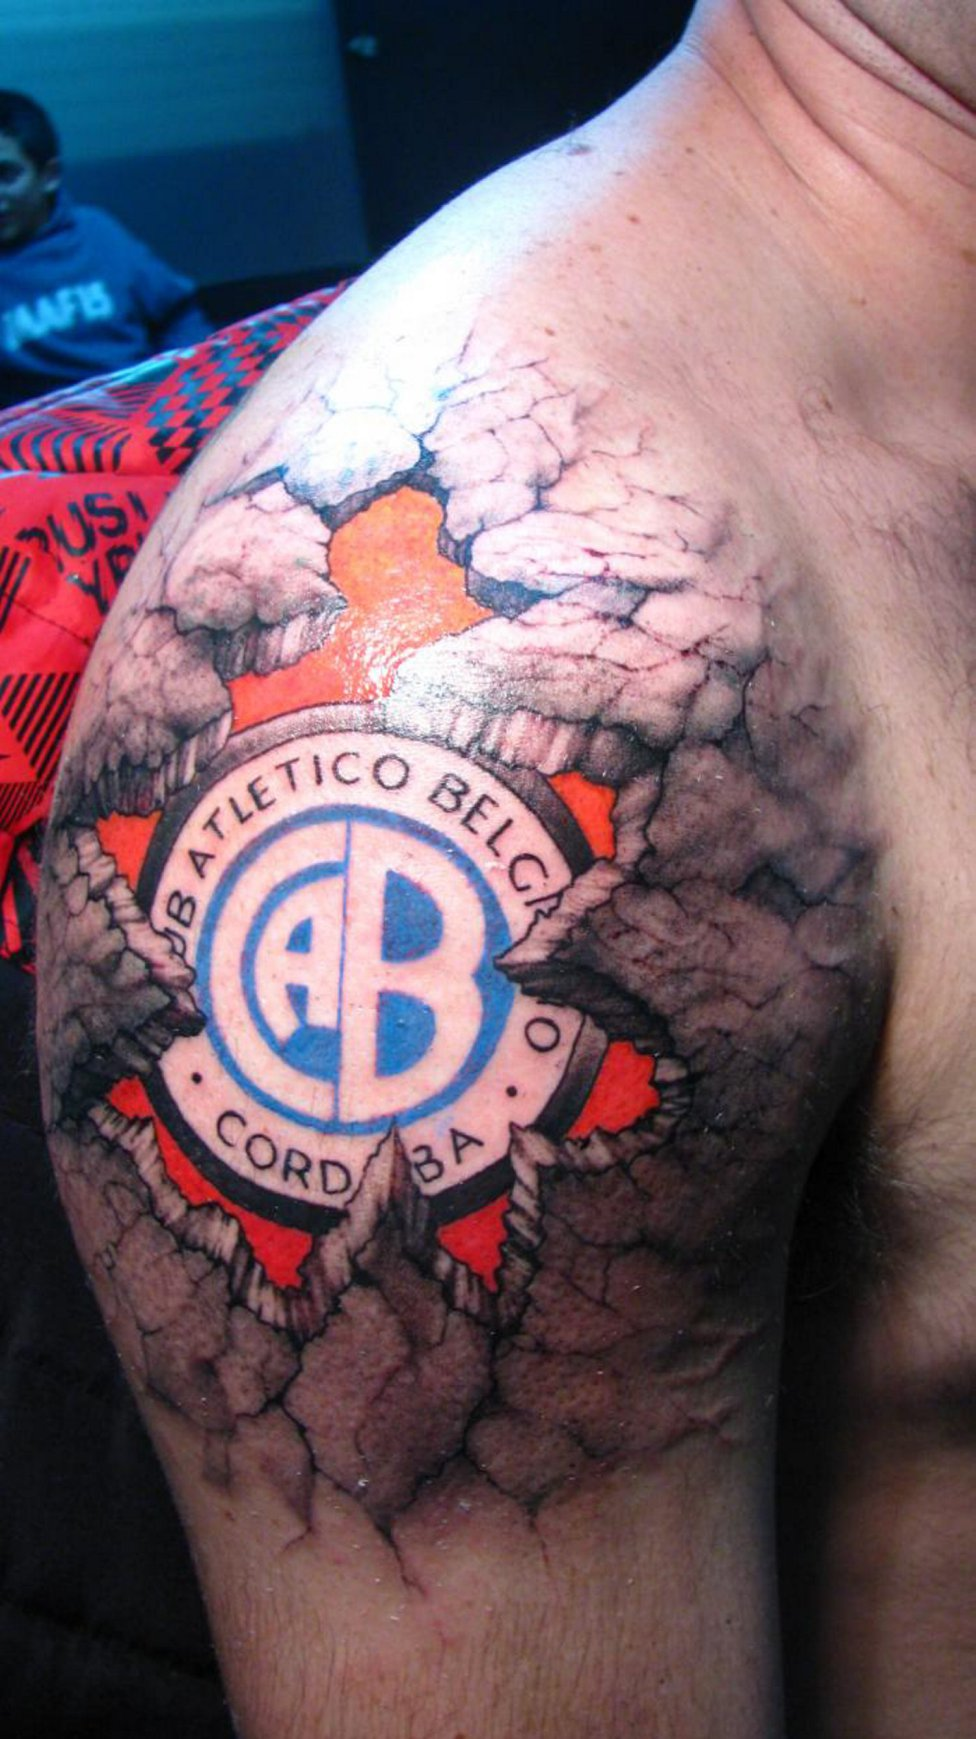 36 Tatuajes De Escudos De Fútbol Que Te Sorprenderán Ascom